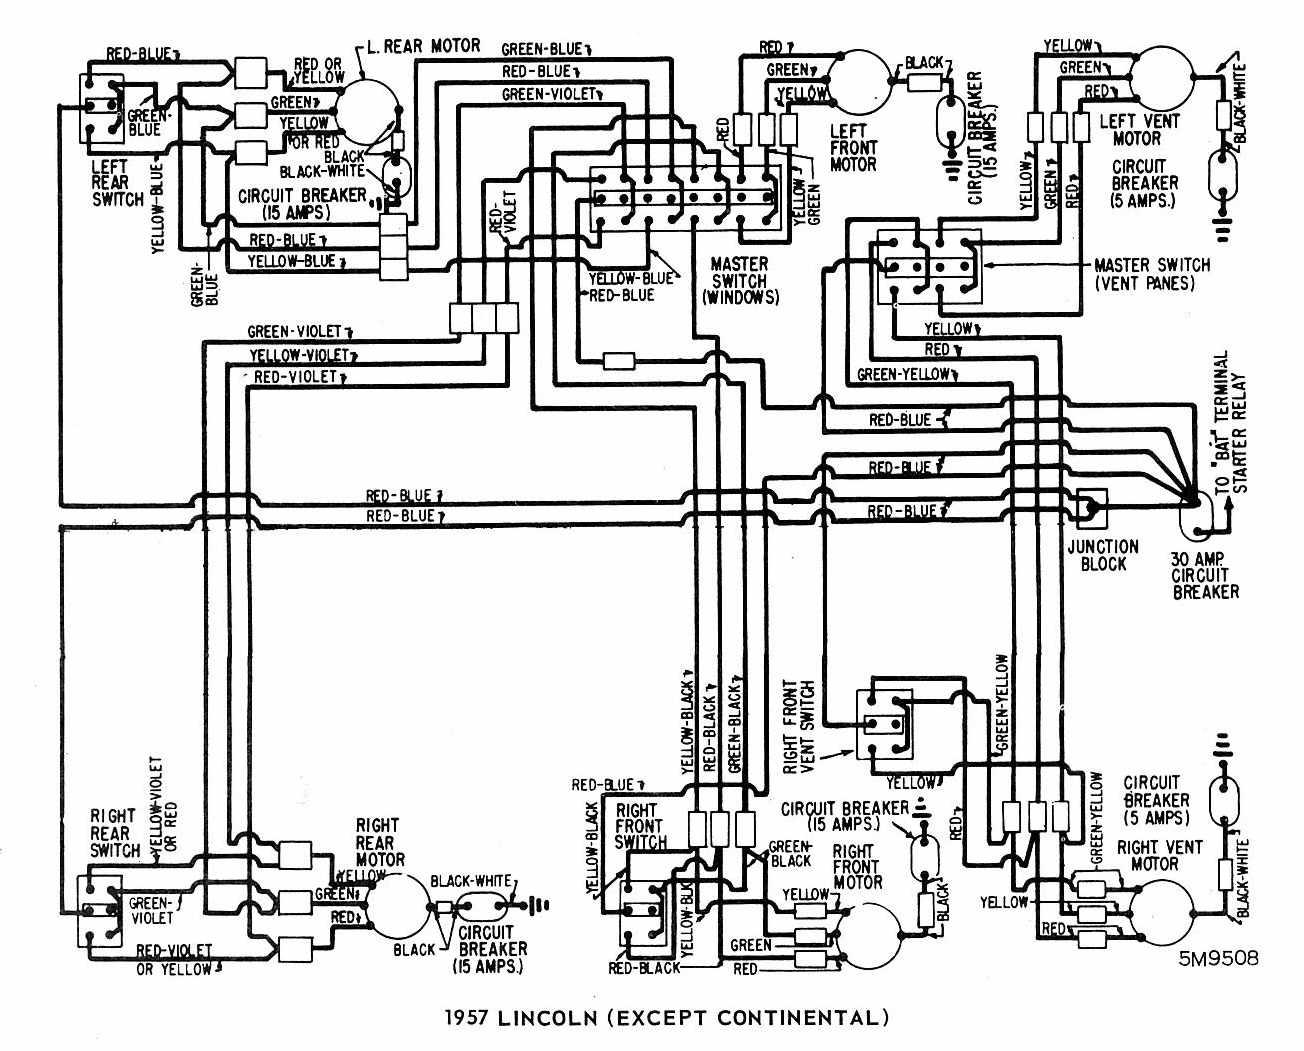 Lincoln K870 Wiring Diagram